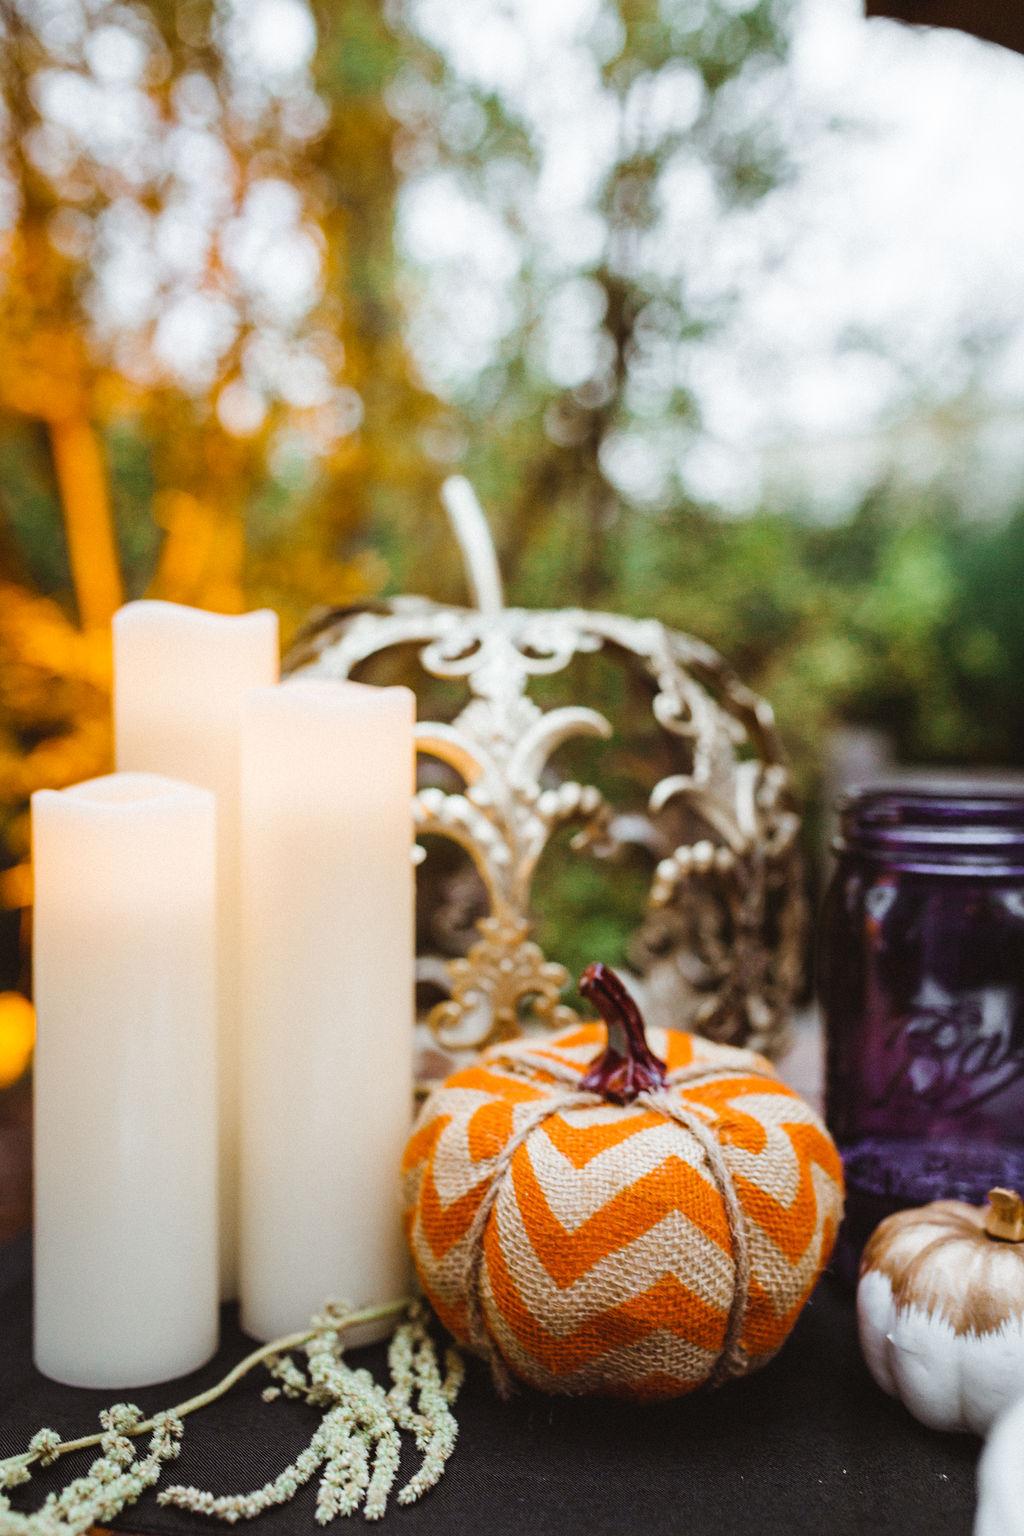 October-Details-Wedding-Pasadena-California-Halloween-Tim-Burton-Alice-Wonderland-Whimsical-Hieusz-Photography-32.jpg